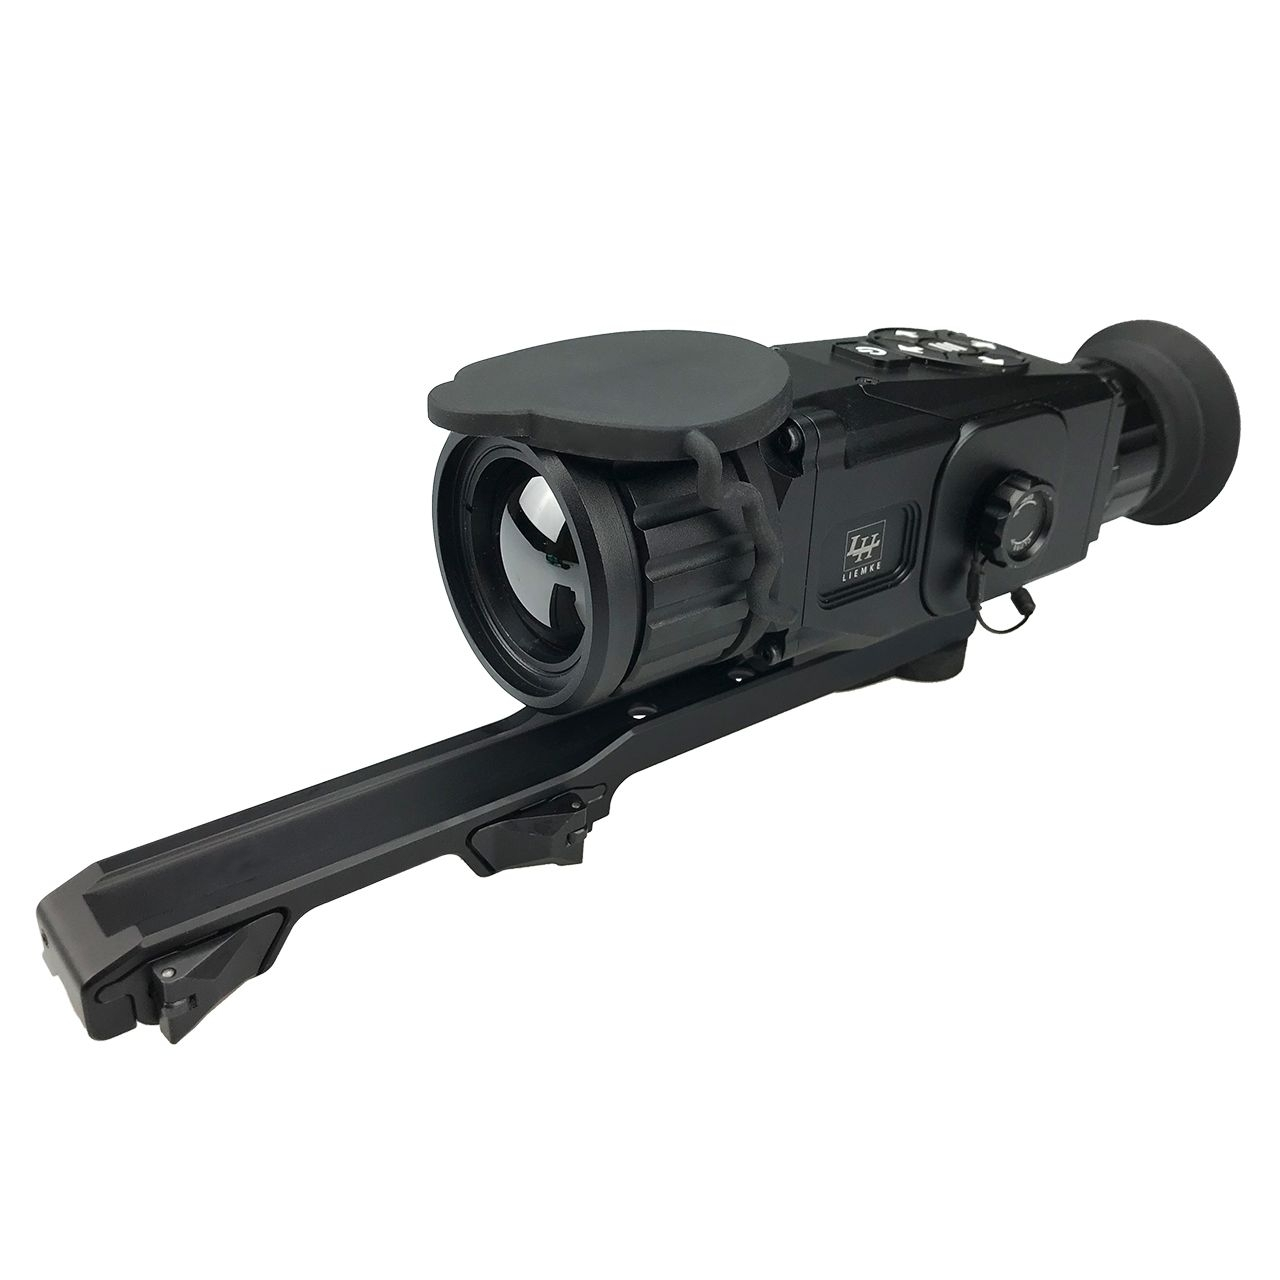 Rifle Mount Typ Long Sauer 303